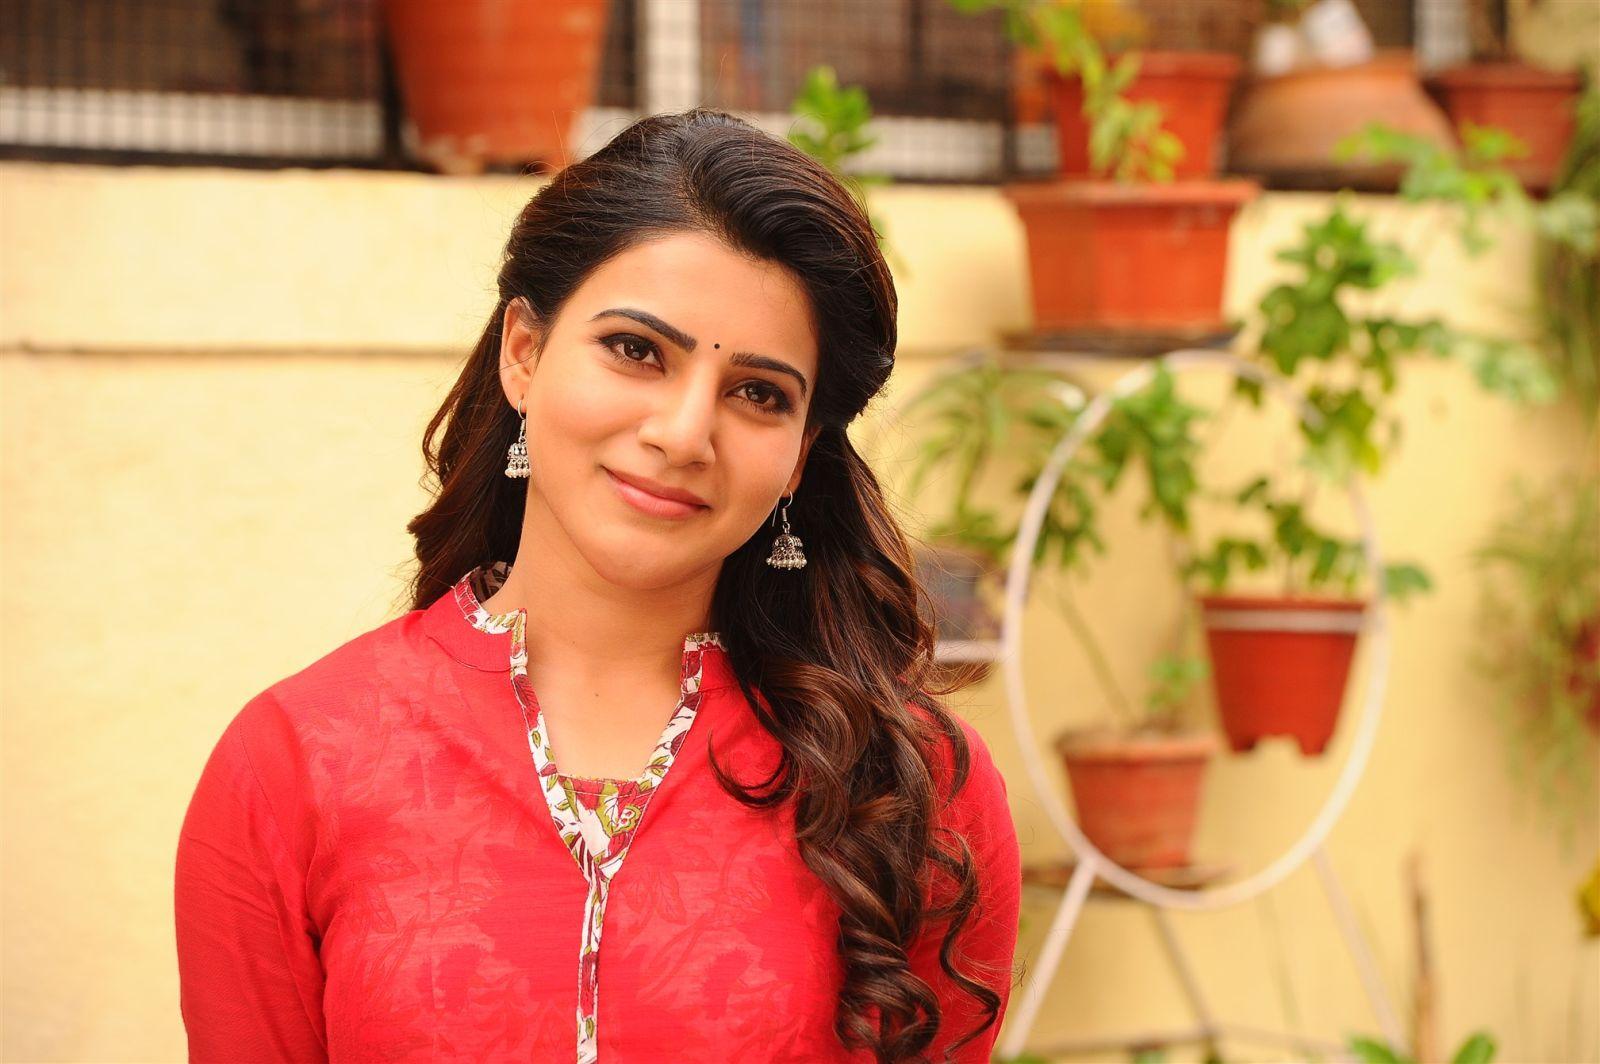 Samantha Navel In Seema Raja Hd: Anirudh Tamil Movie Latest Stills